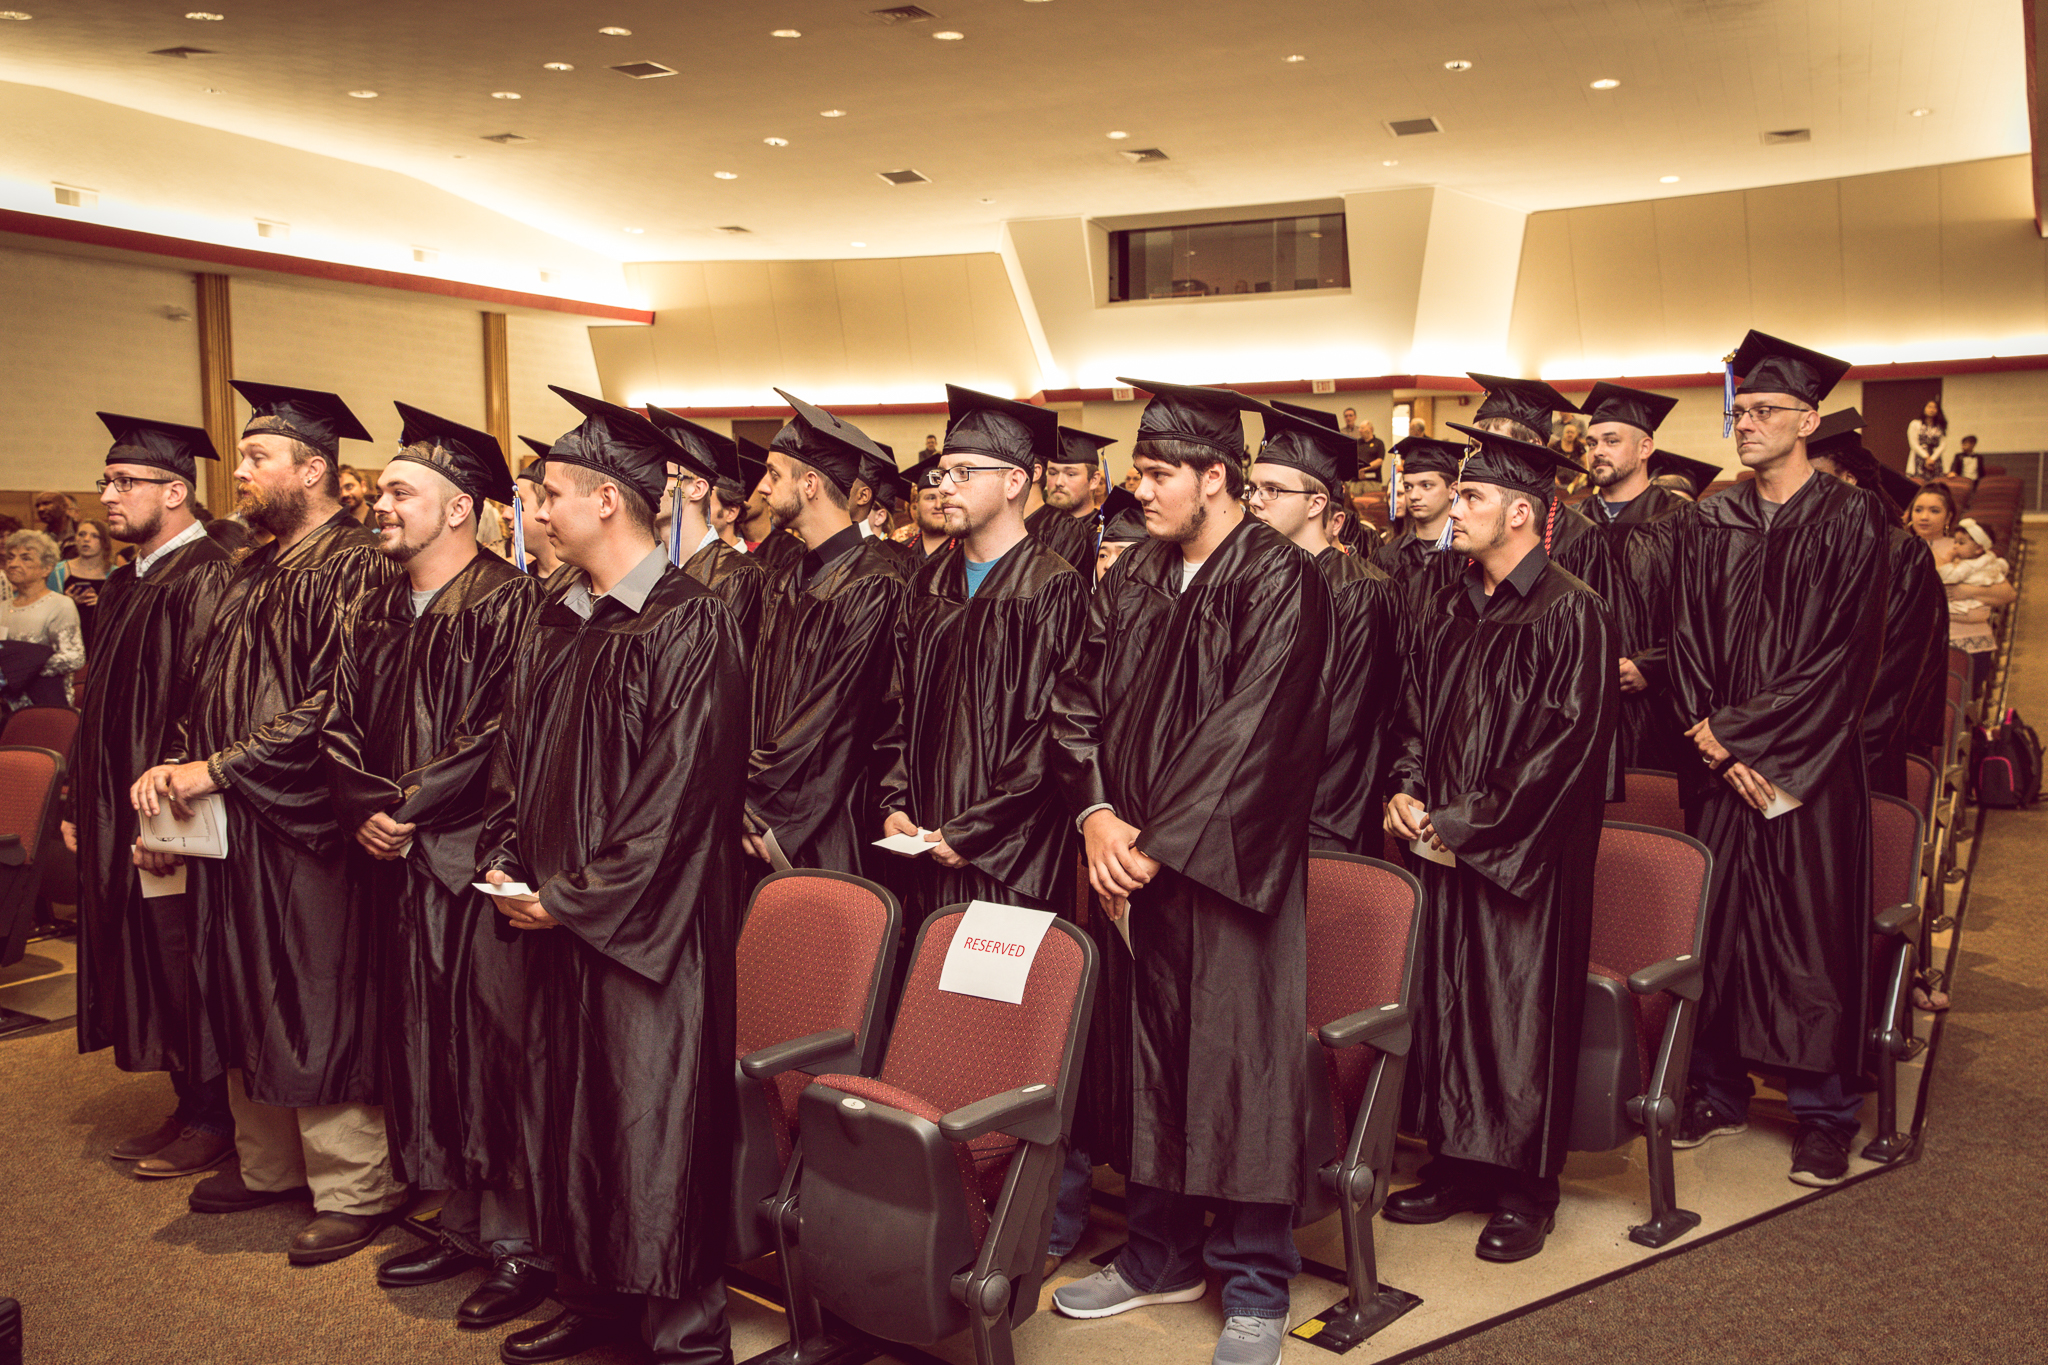 ncst_fall_2017_graduation-3.jpg